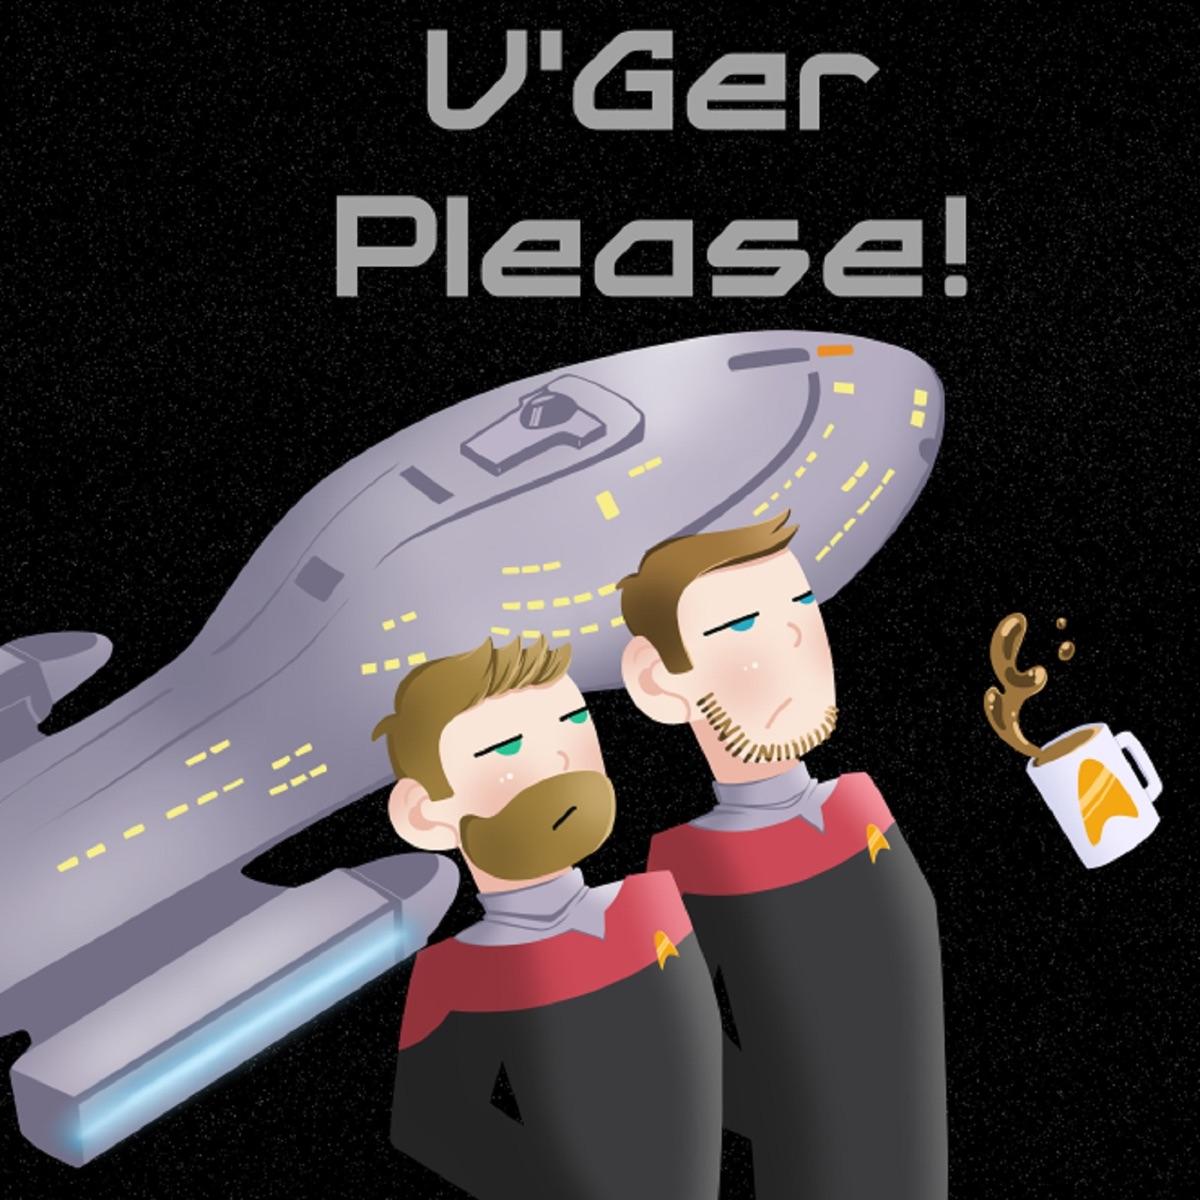 V'Ger Please!